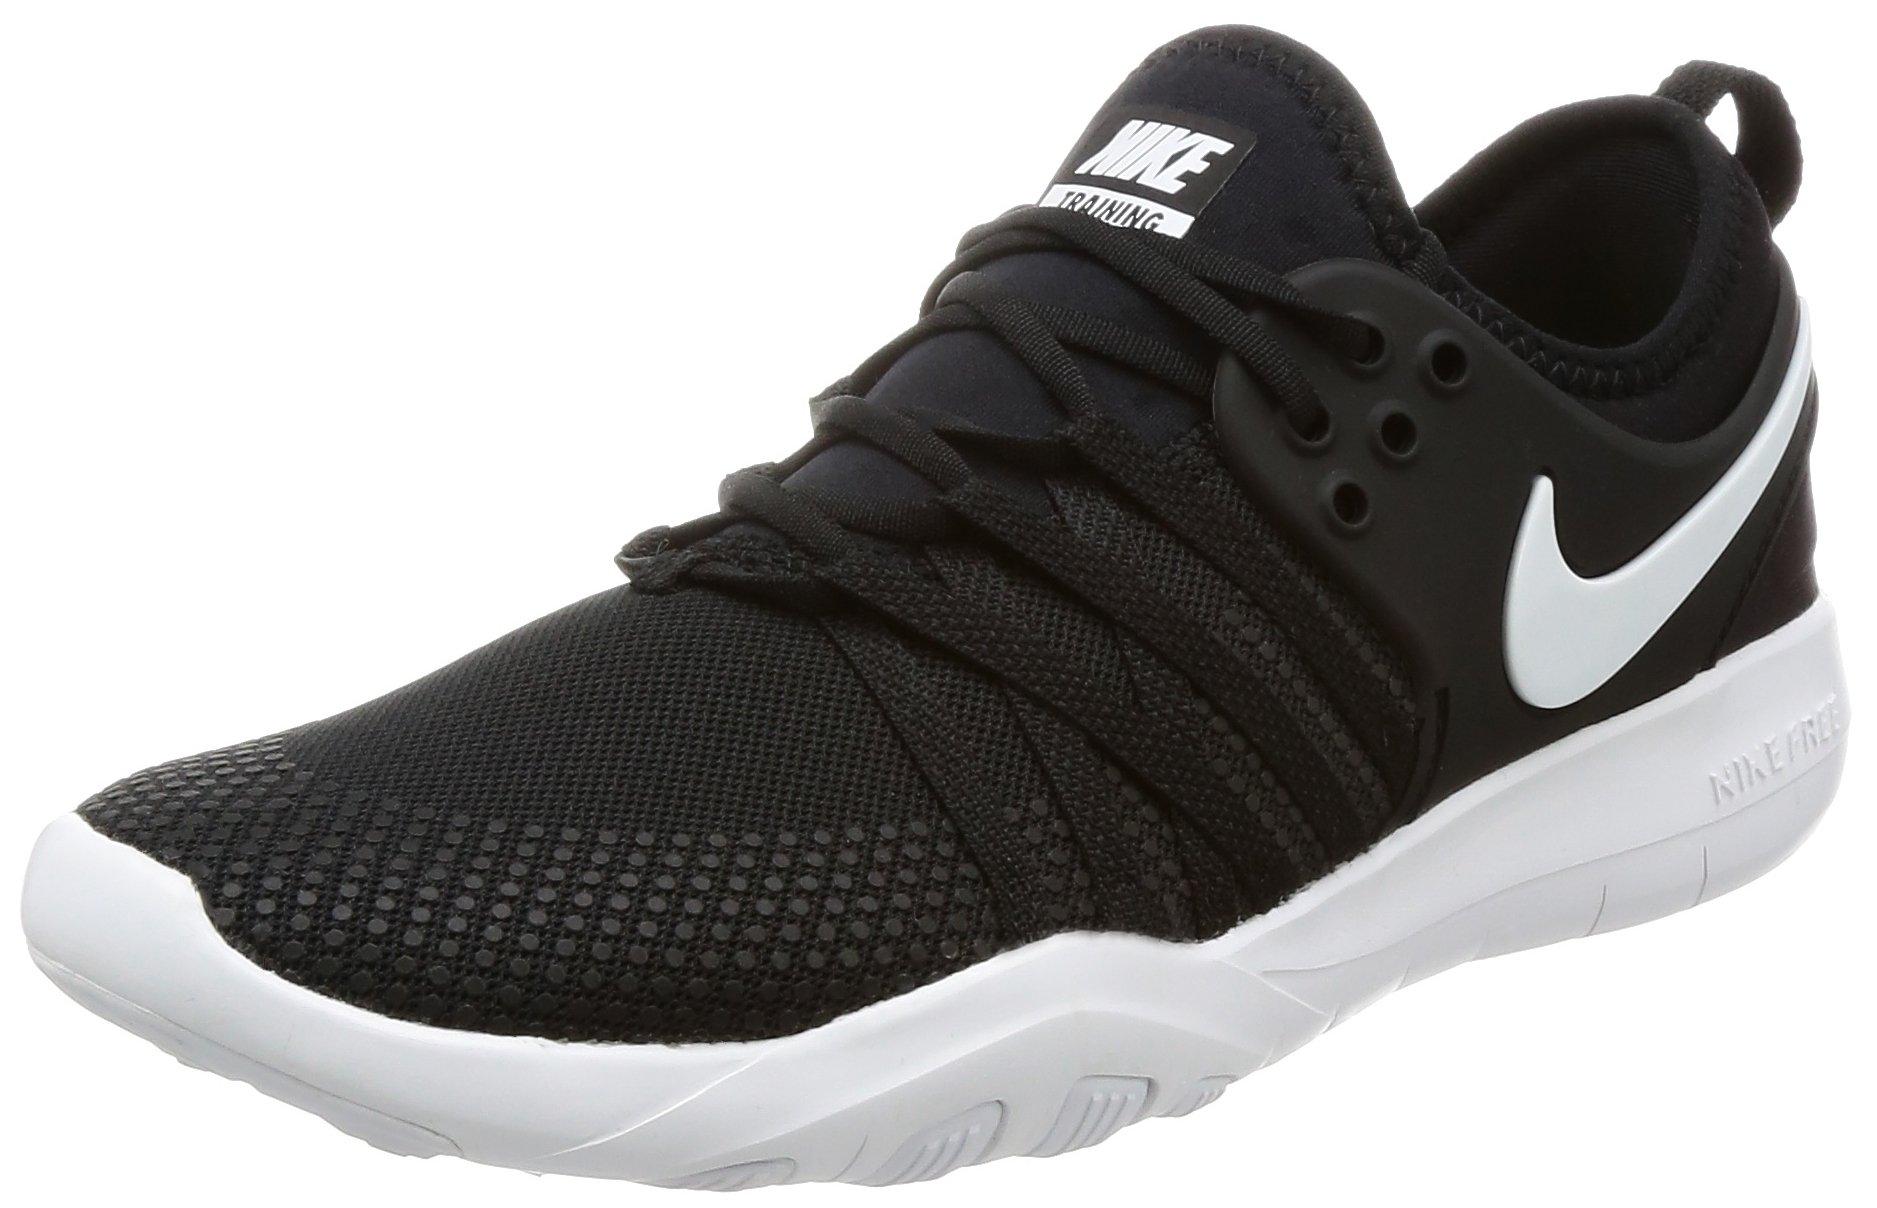 NIKE Free TR 7 Black/White Women's Cross Training Shoe, Size 8.5, Black/White